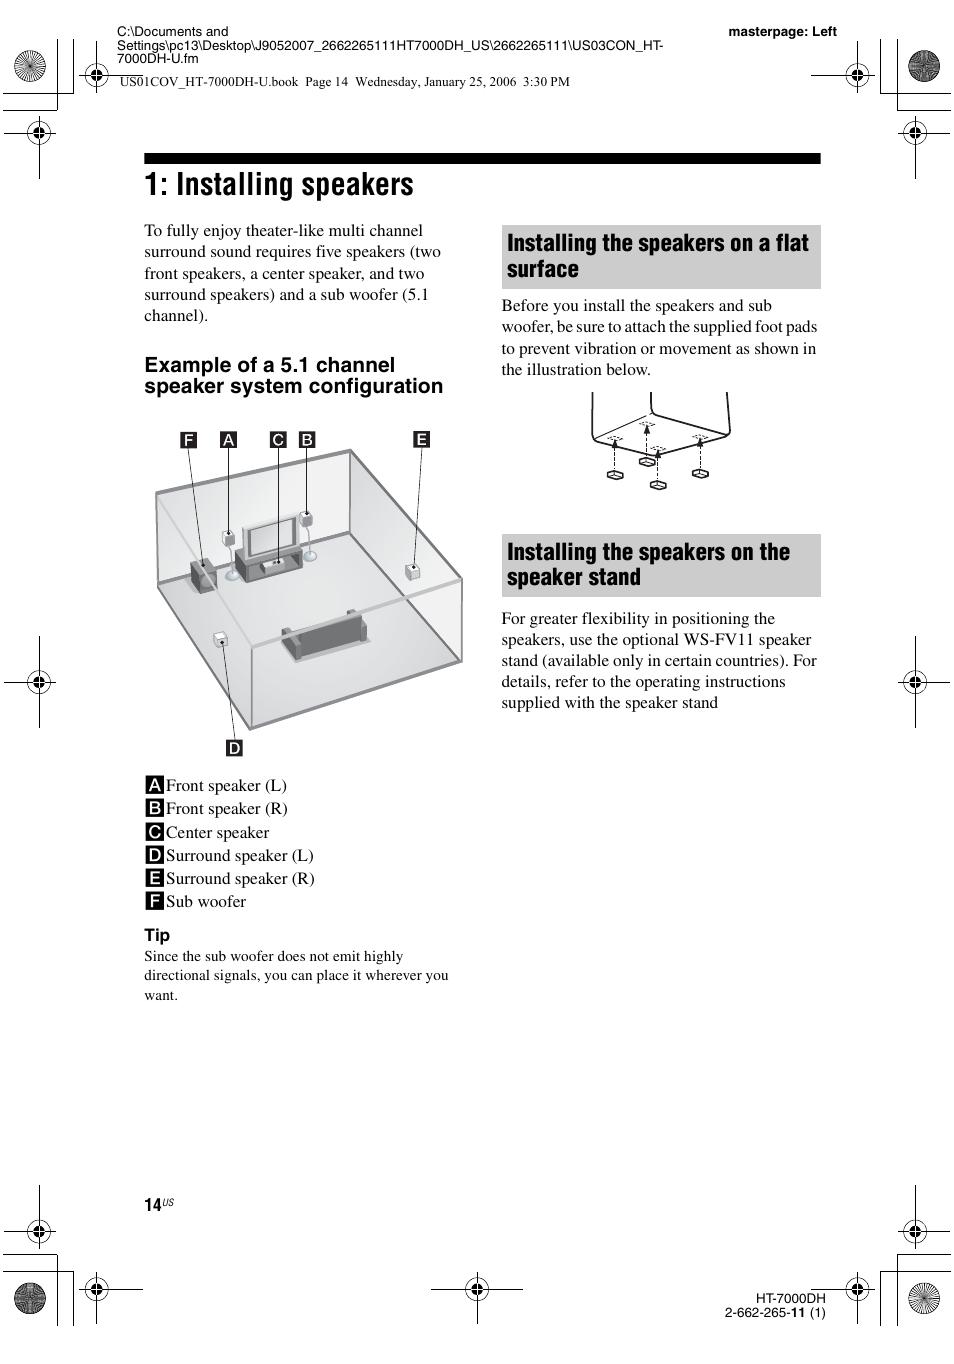 installing speakers sony str k7000 user manual page 14 84 rh manualsdir com sony str-k7000 remote sony str k700 manual